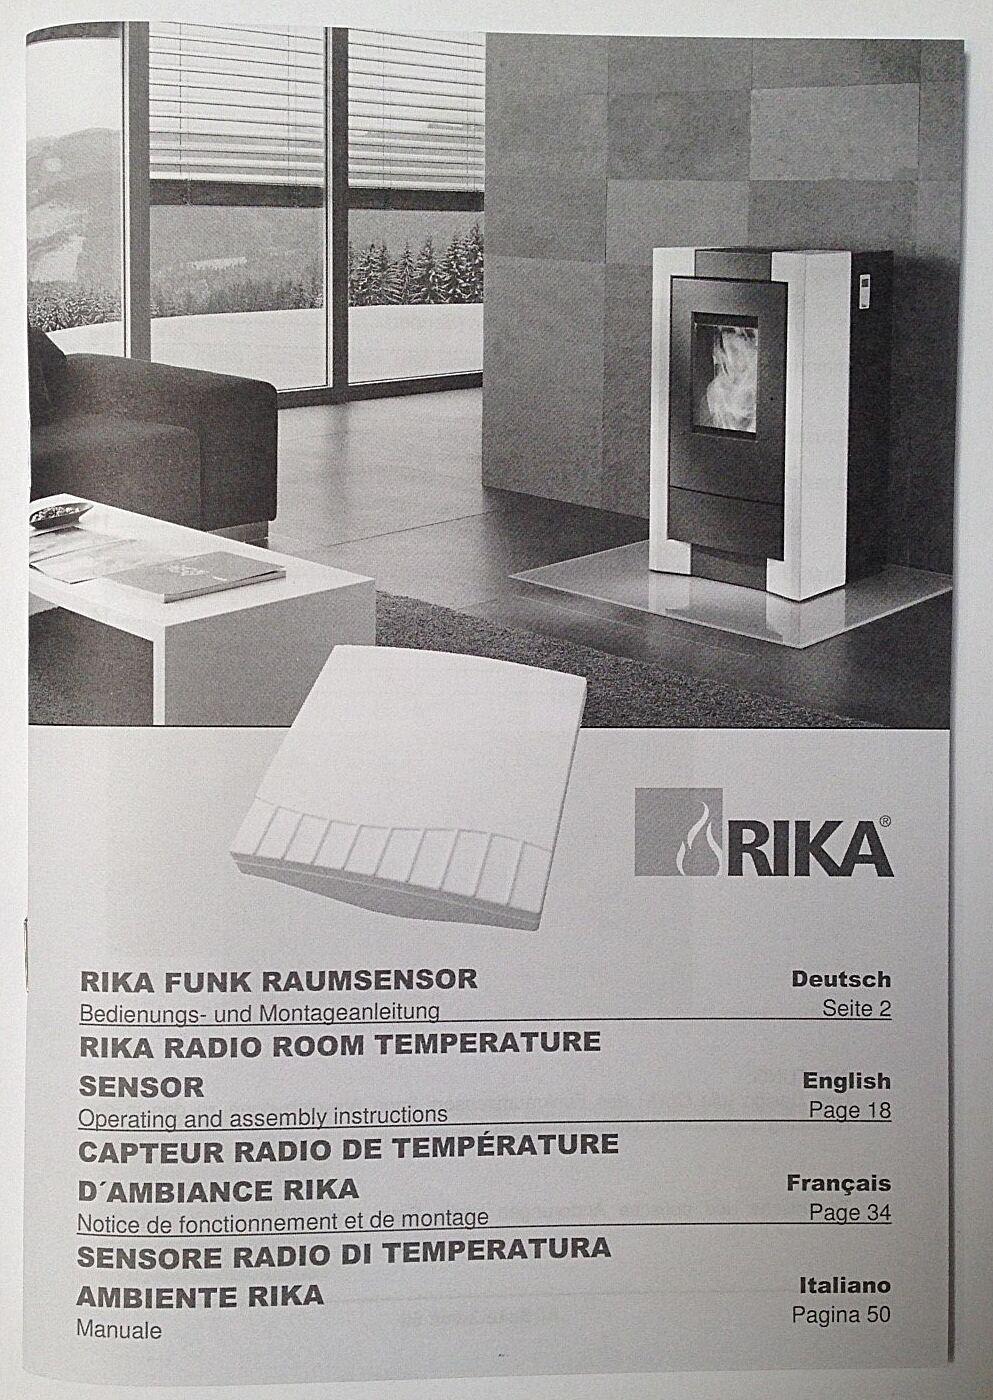 Rika Raumsensor Funk-Sensor Funk passend für viele Rika Pelletöfen E14558